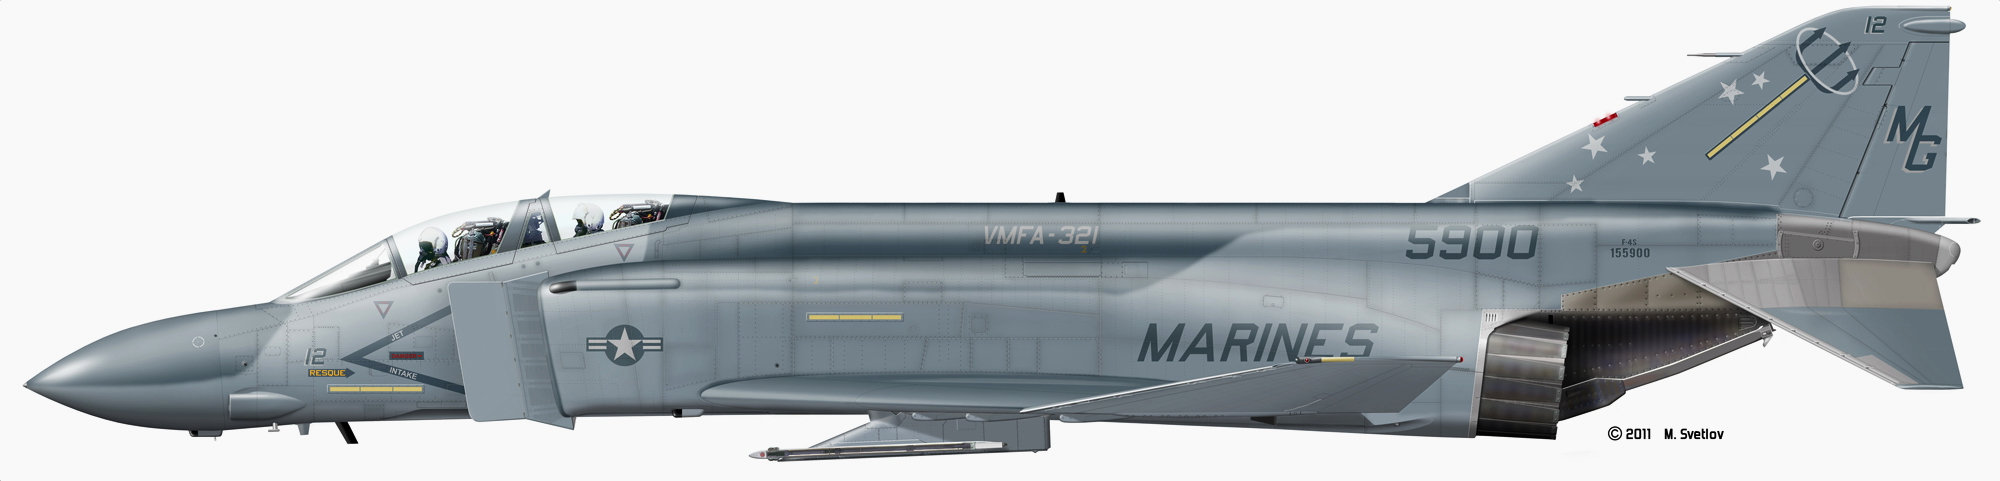 McDonnell Douglas F-4 Phantom IIN (interceptor y cazabombardero supersónico, biplaza, bimotor y de largo alcance USA) 3_212